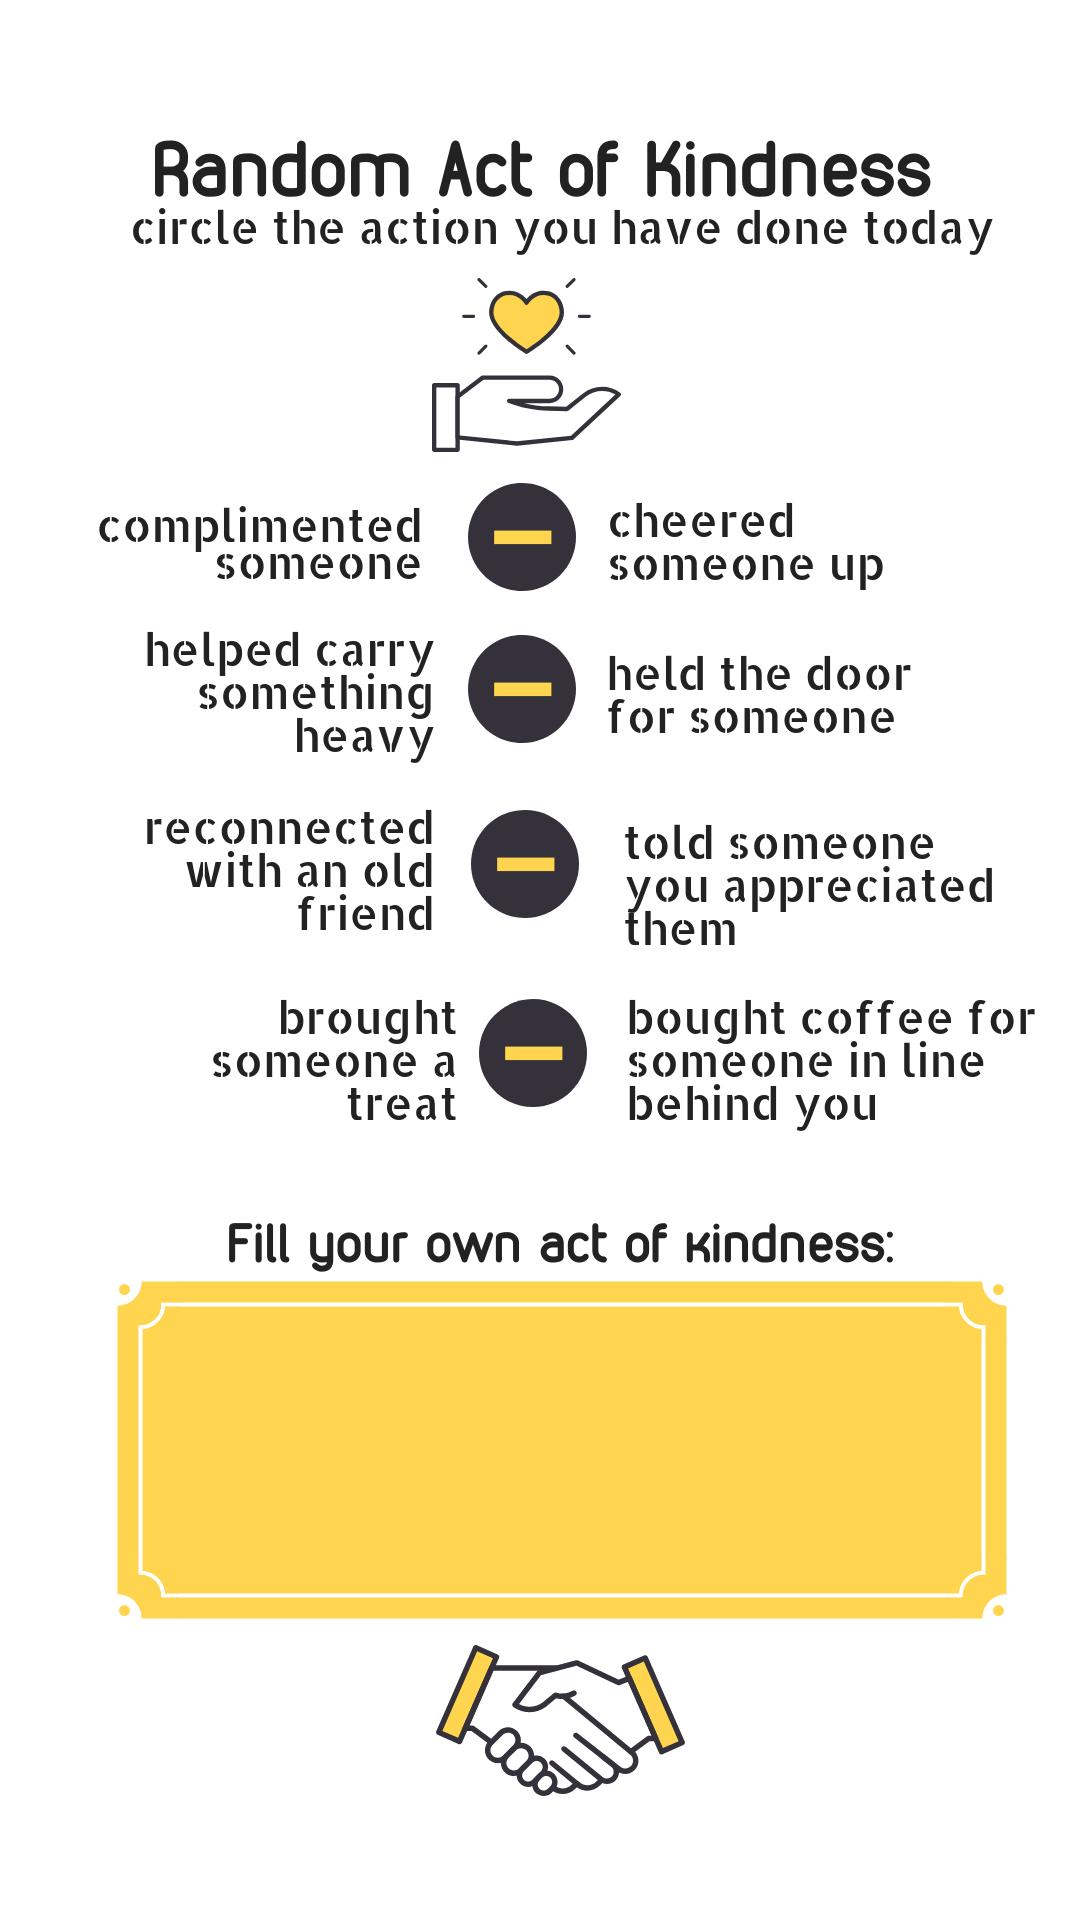 Original template for the Random Act of Kindness #UWRAK contest.